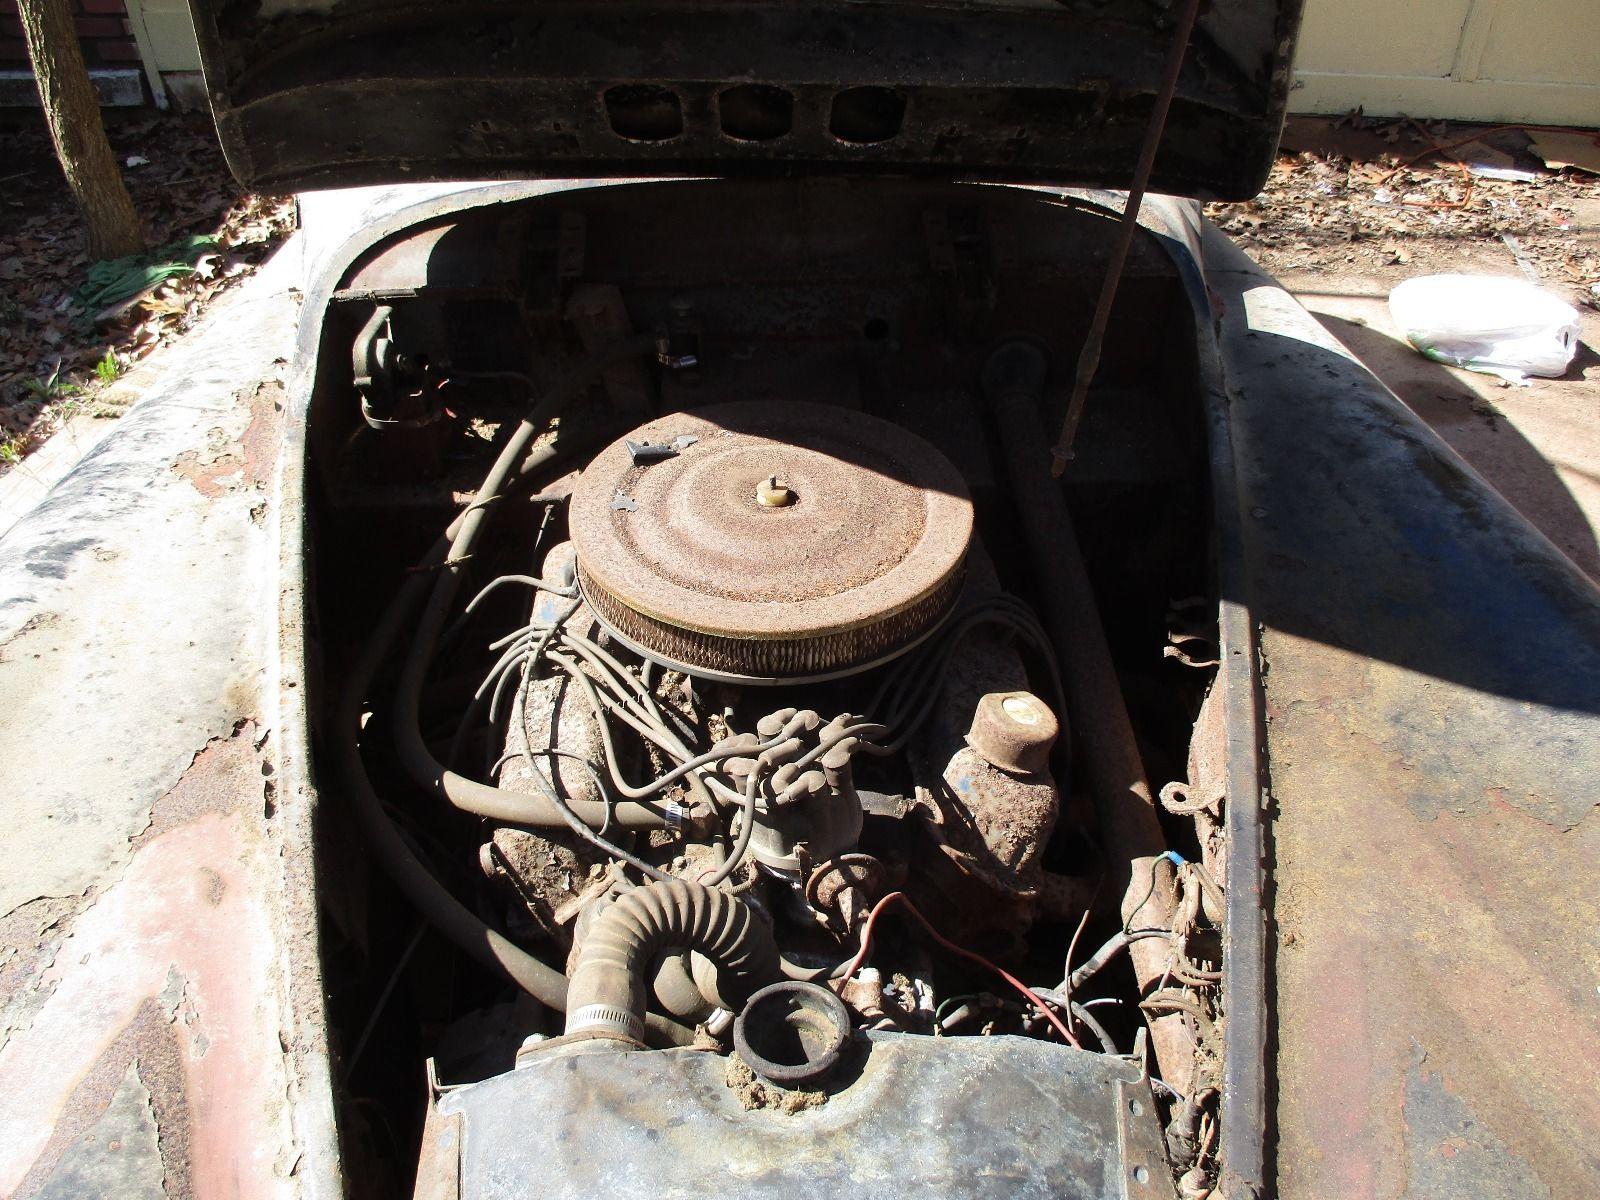 Yes, your beady little eyeballs do not deceive you. A V8 tidily ensconced under that slender Jaguar XK120 hood.